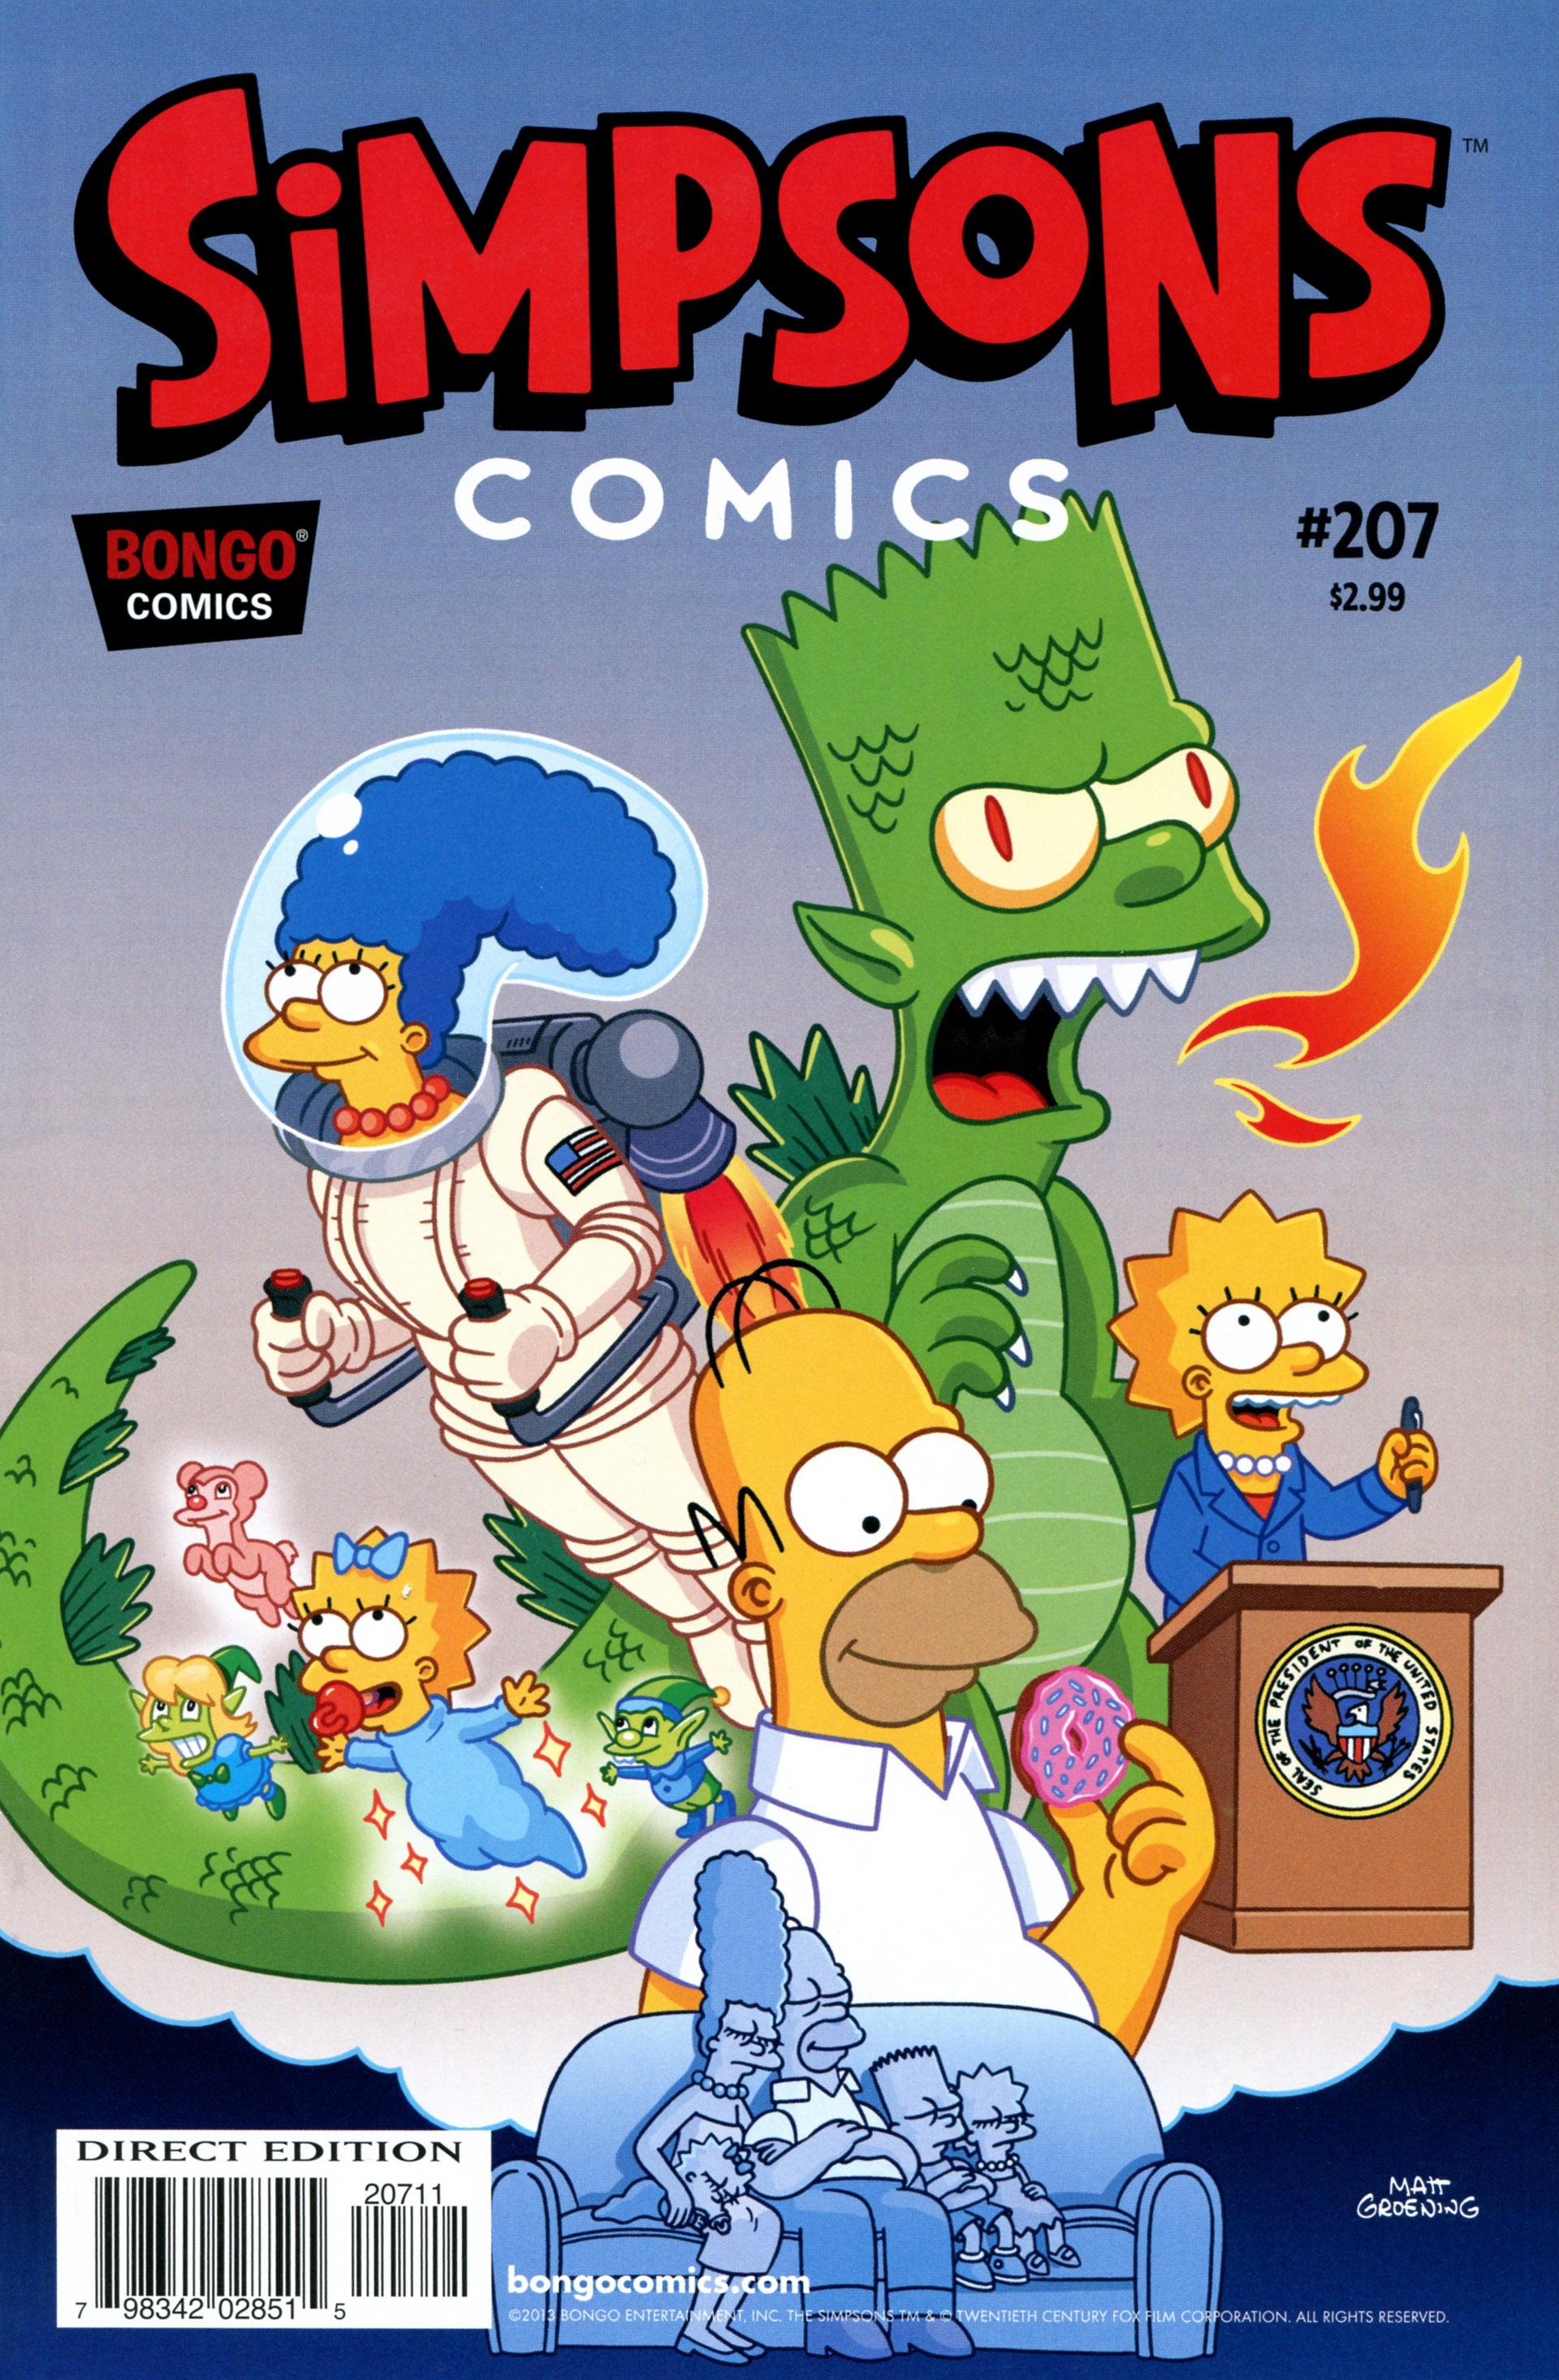 Simpsons Comics 207 Page 1